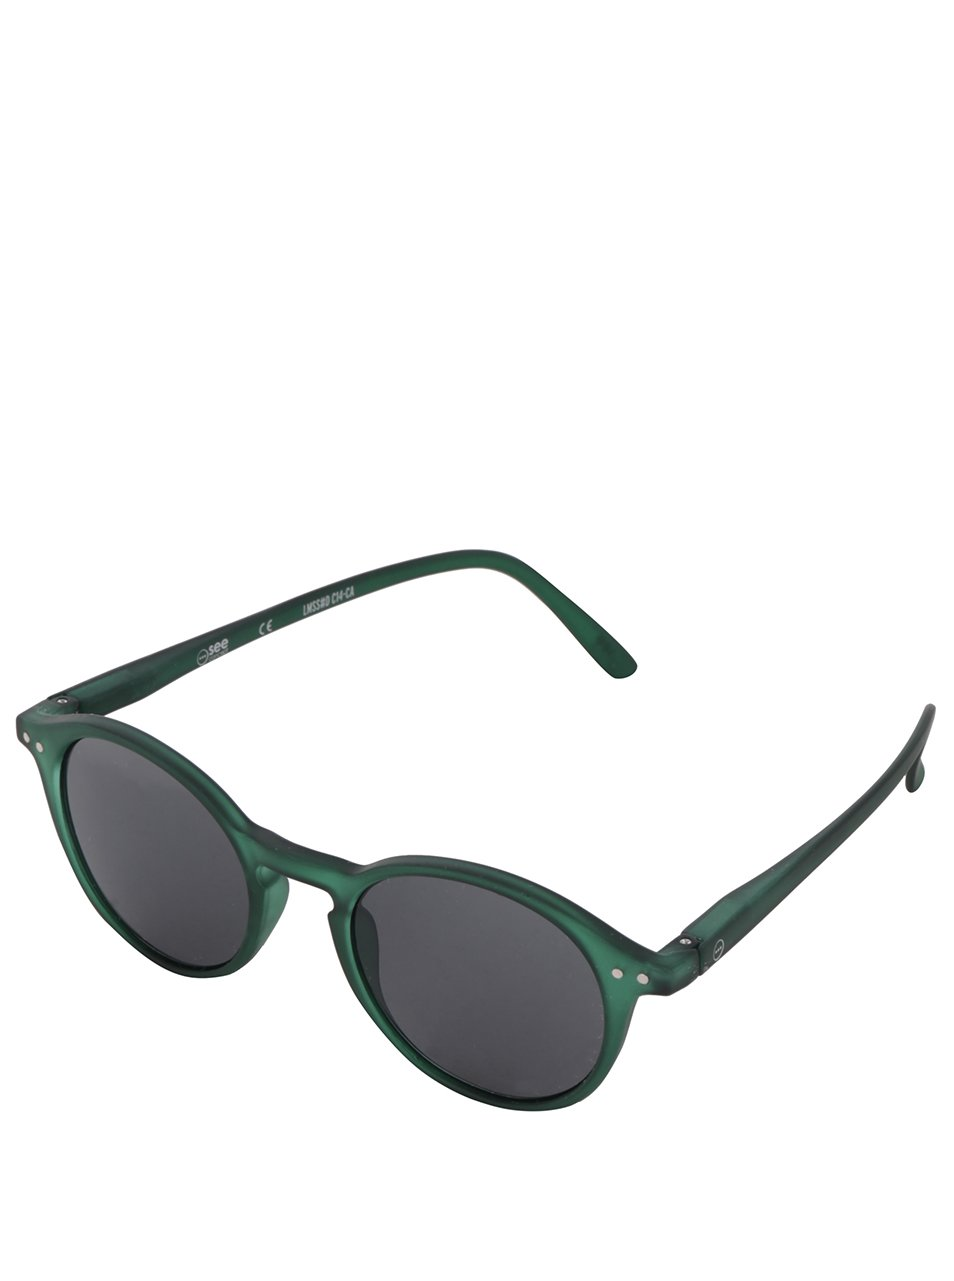 96b17a313 Zelené unisex slnečné okuliare s čiernymi sklami IZIPIZI #D | Moda.sk